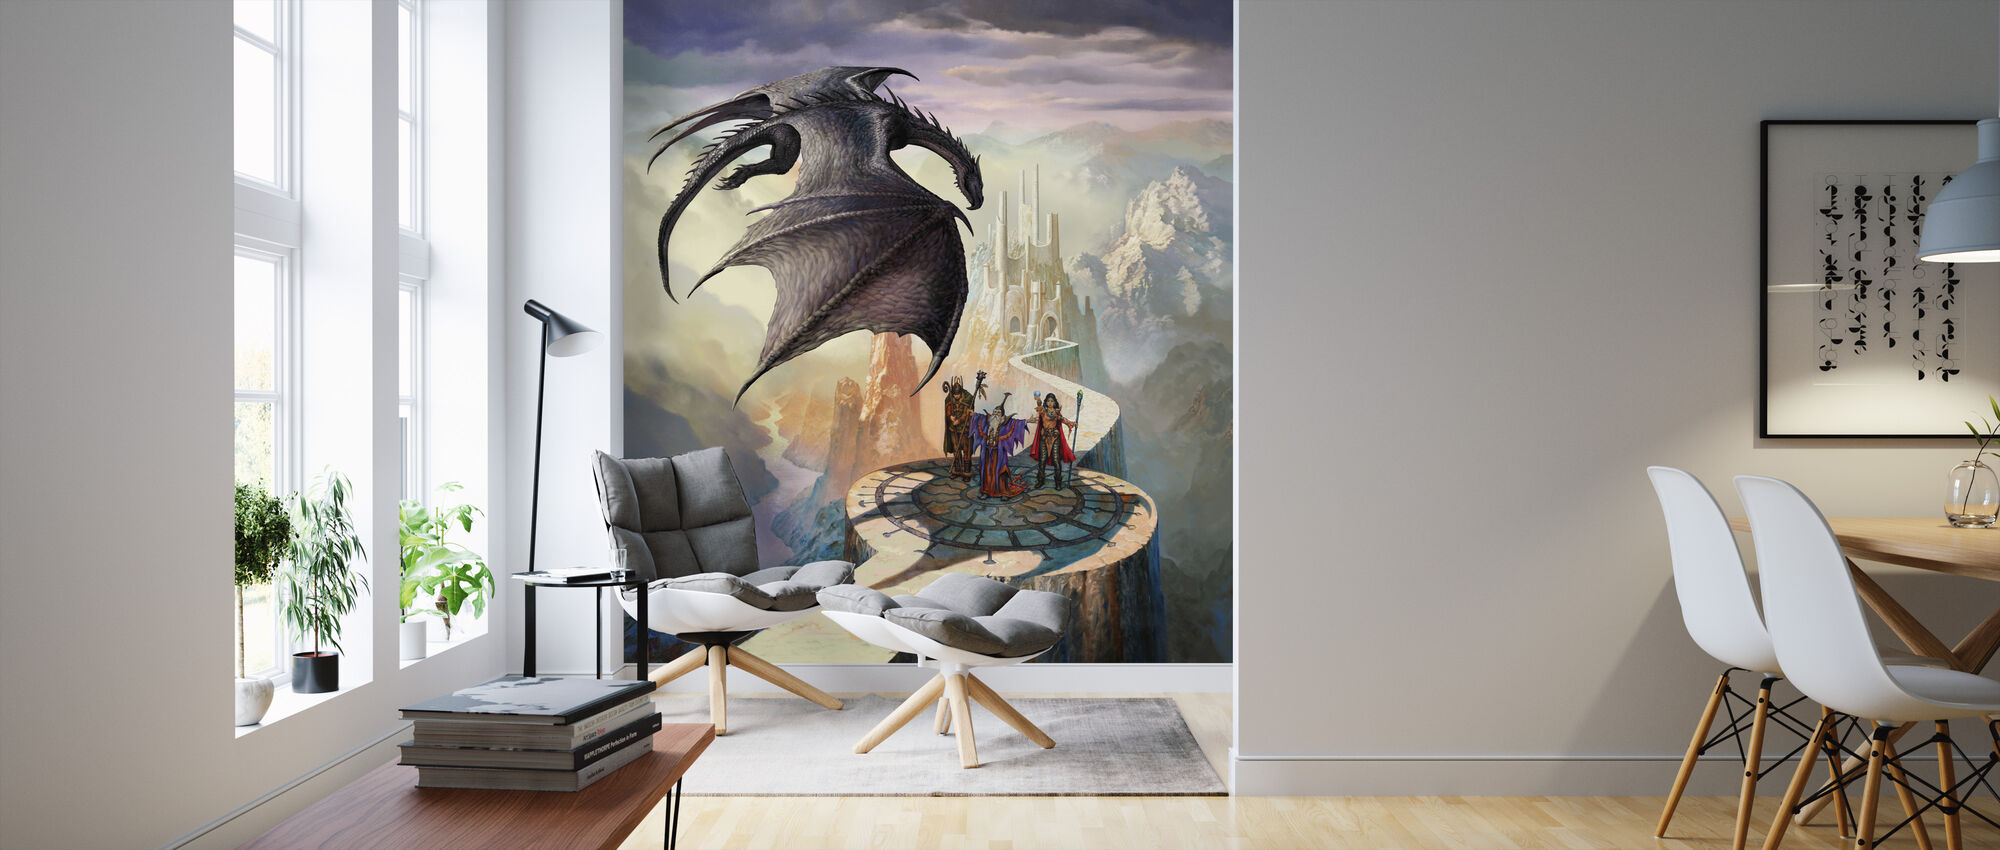 Callers - Wallpaper - Living Room